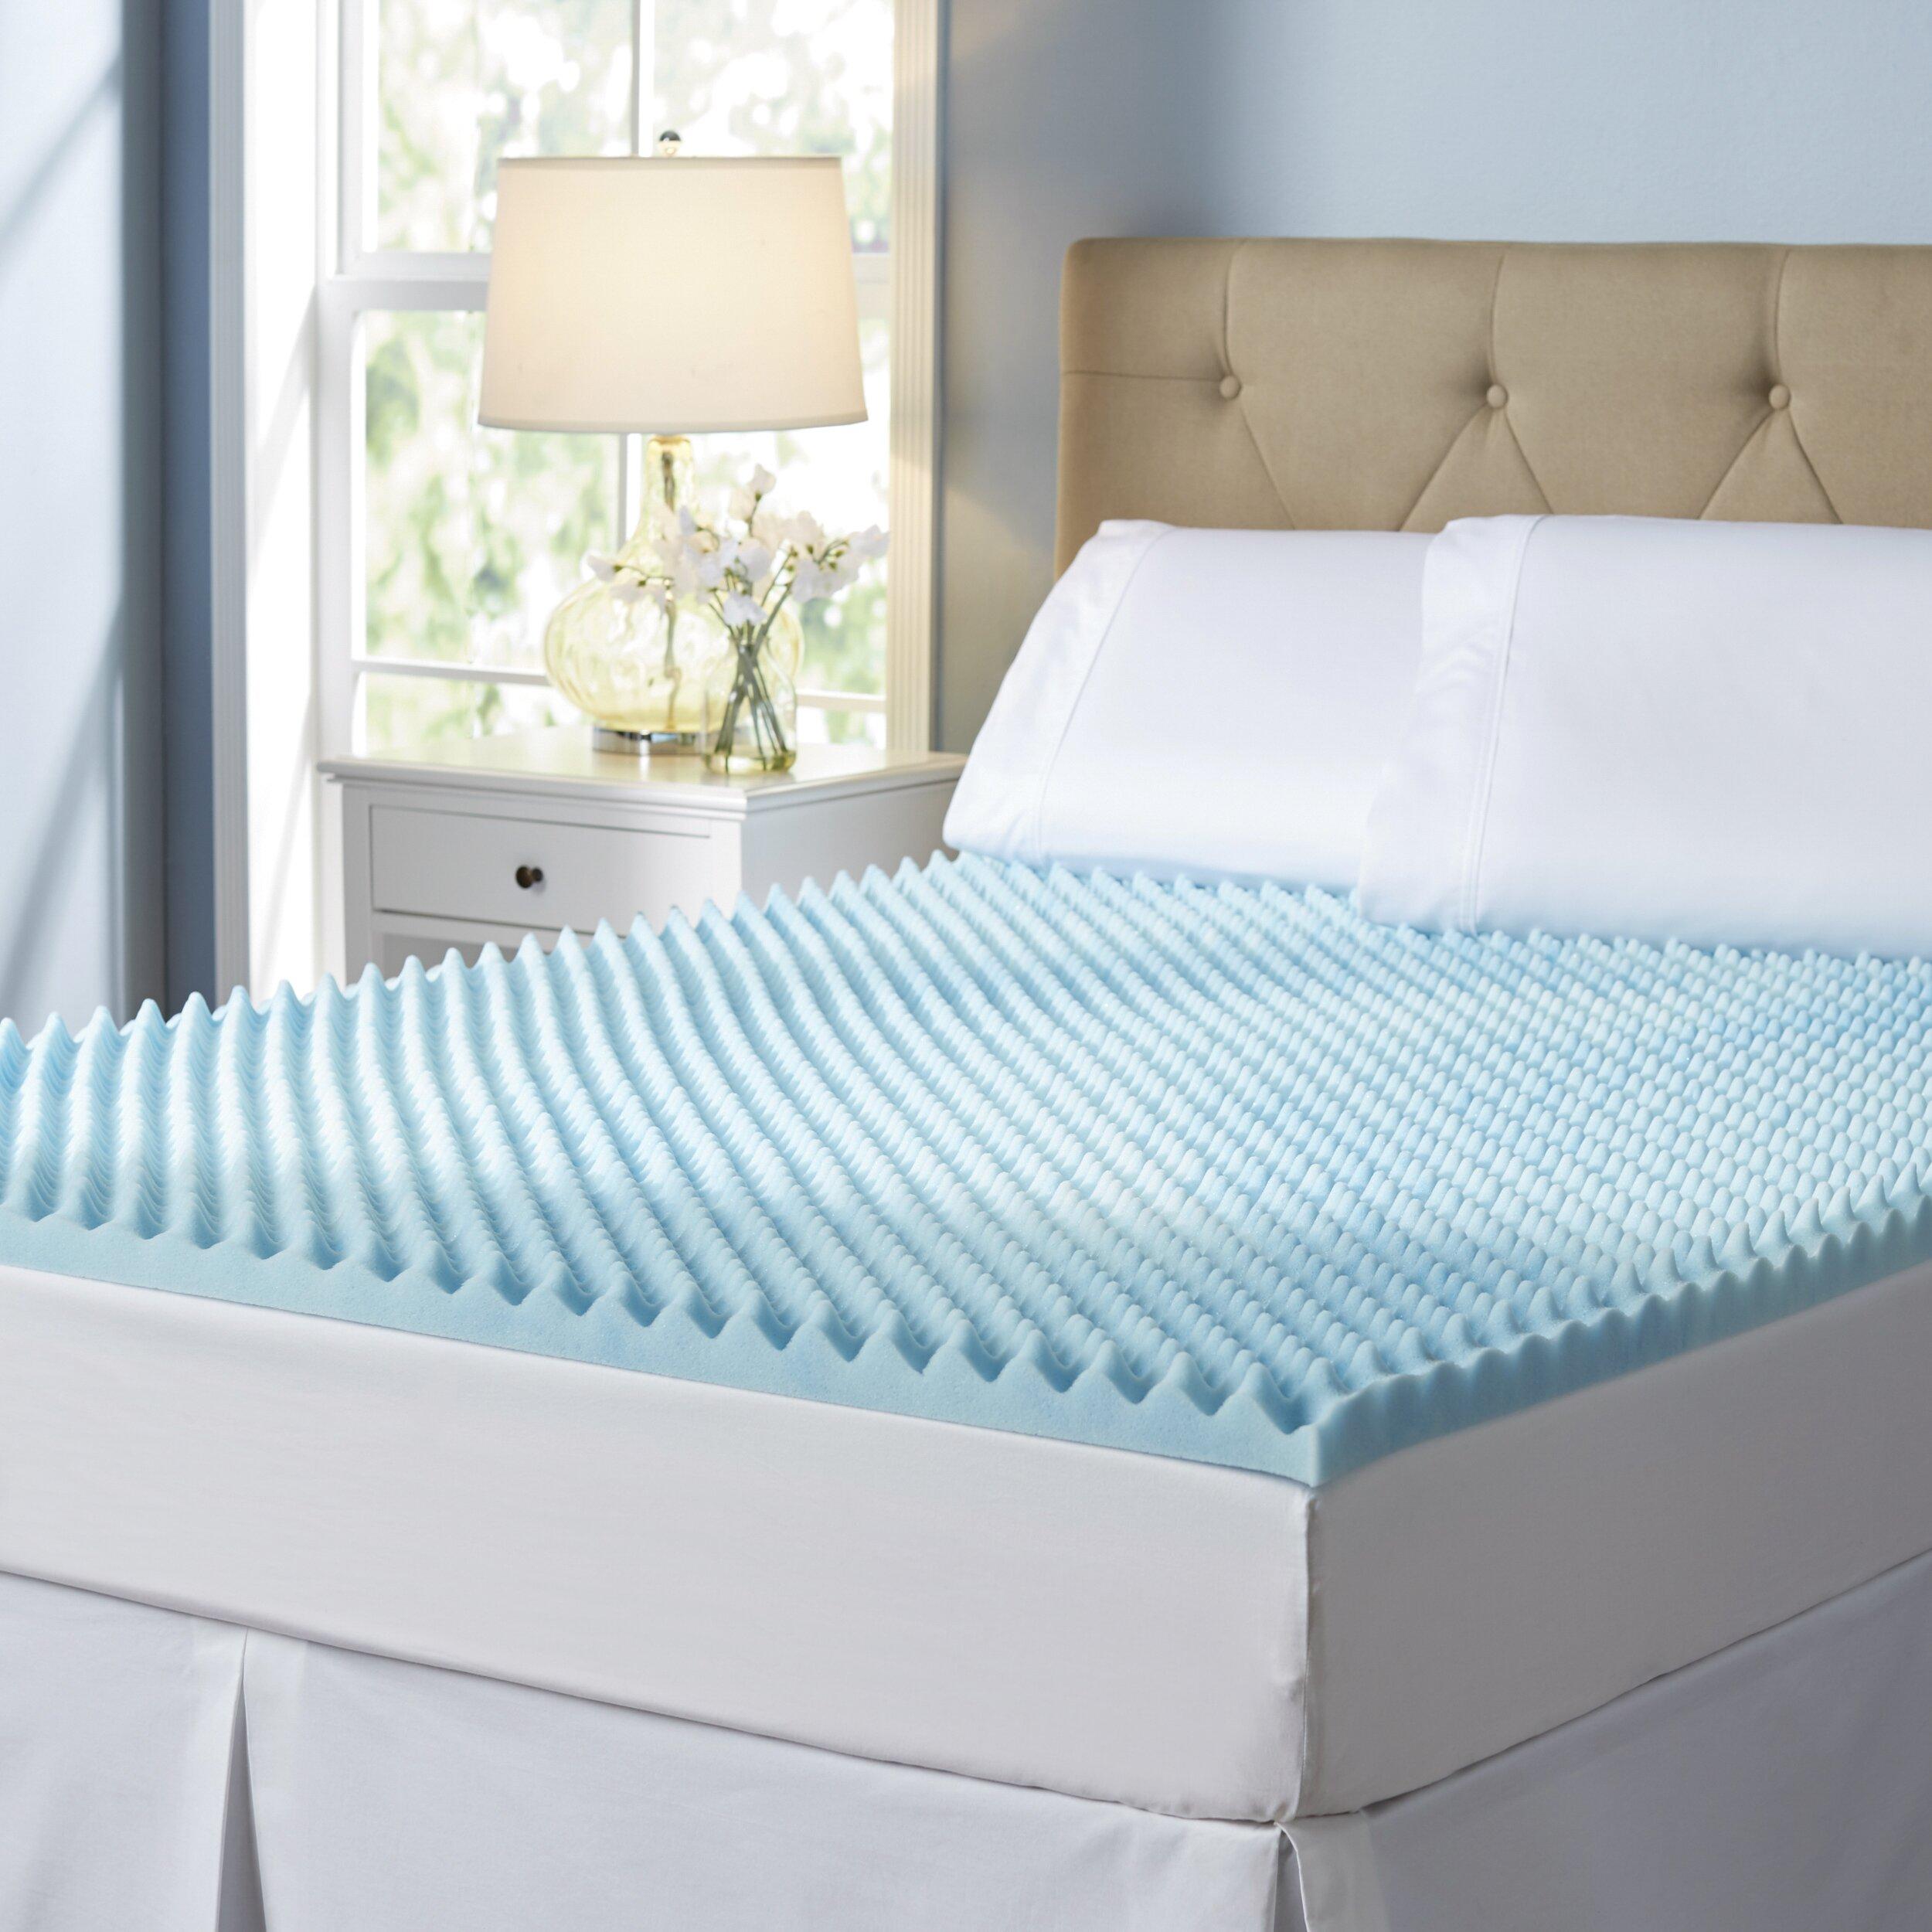 wayfair sleep wayfair sleep 2 gel memory foam mattress topper reviews wayfair. Black Bedroom Furniture Sets. Home Design Ideas